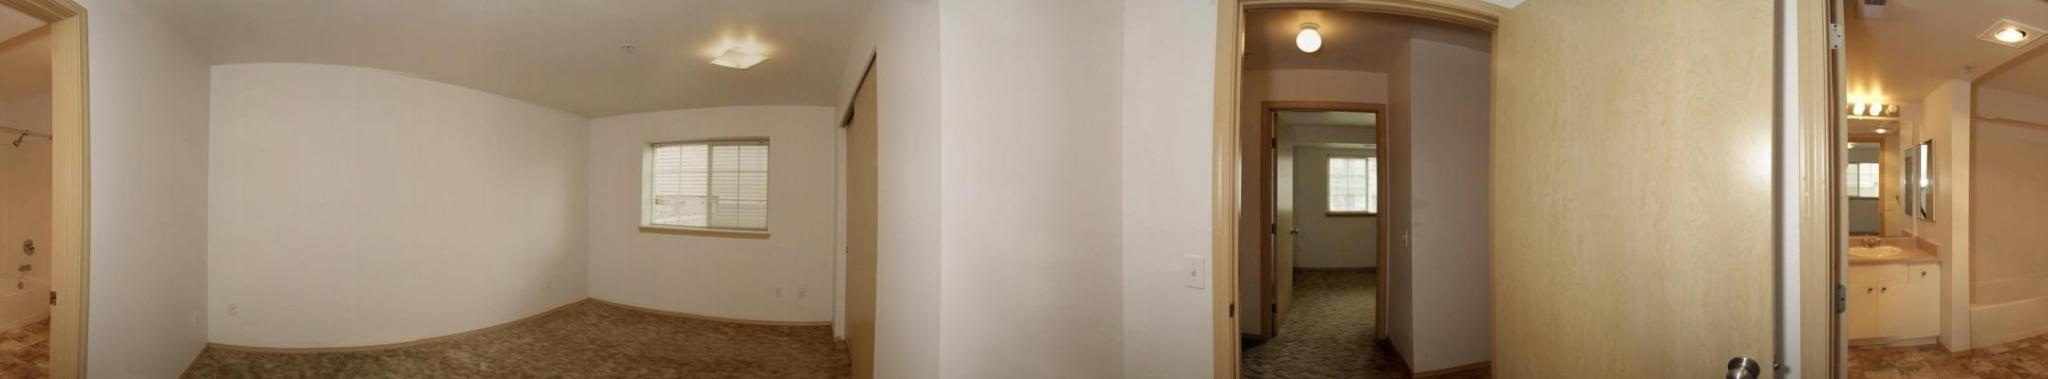 Apartment Tour 2